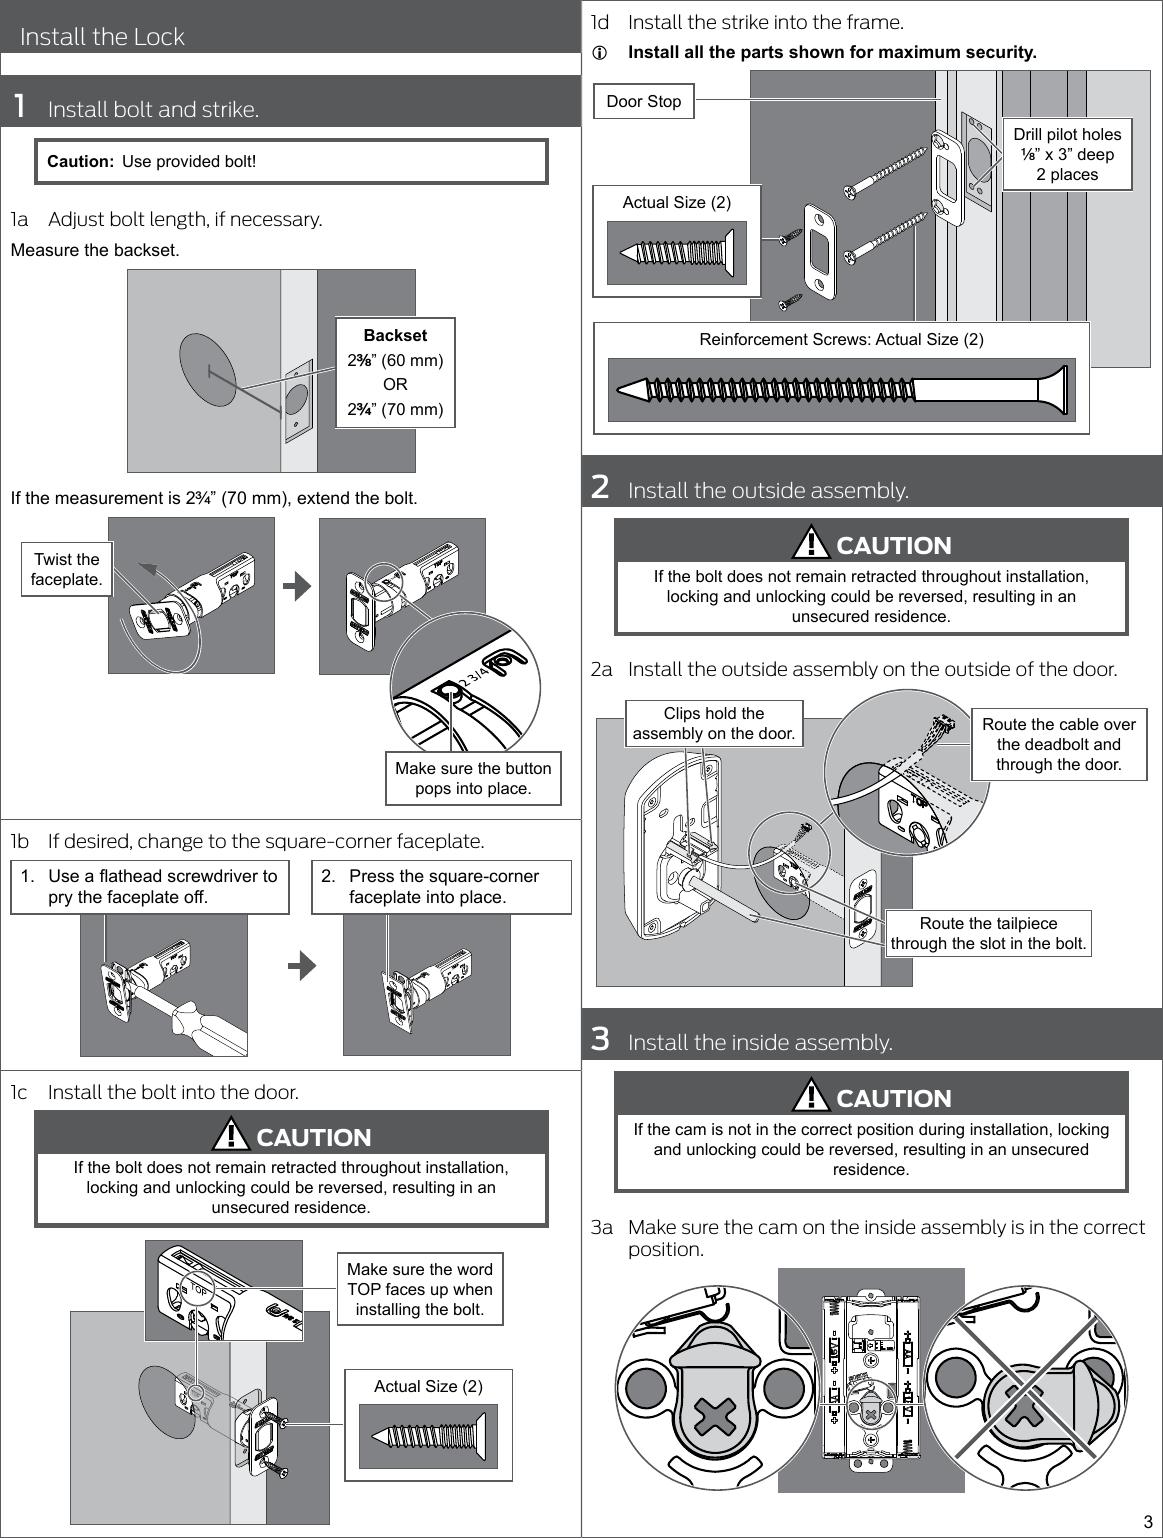 defiant electronic deadbolt installation instructions best electronics 2017. Black Bedroom Furniture Sets. Home Design Ideas